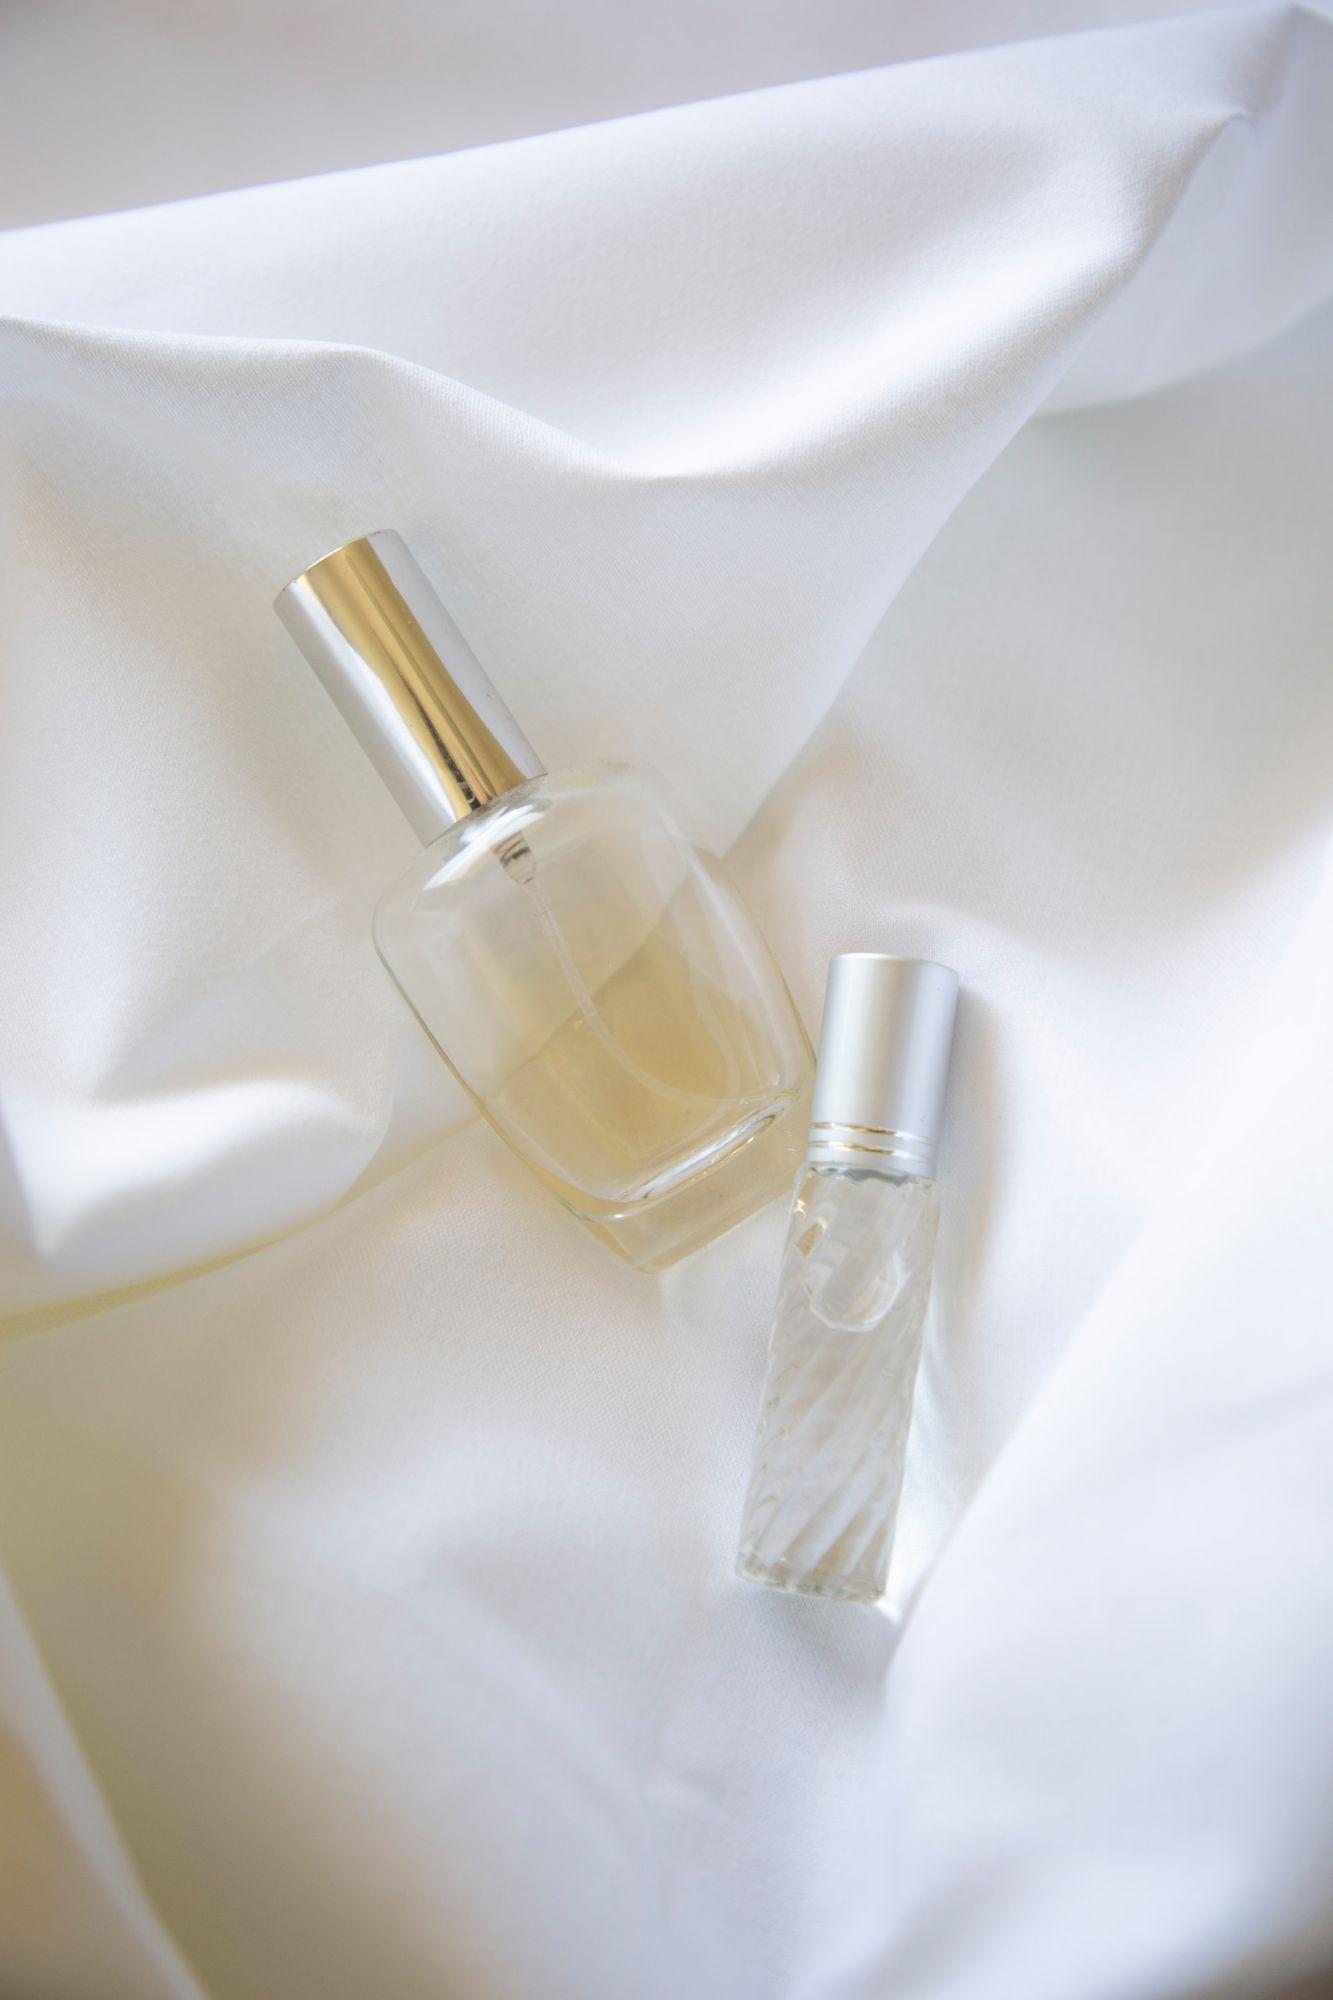 A refillable perfume bottle